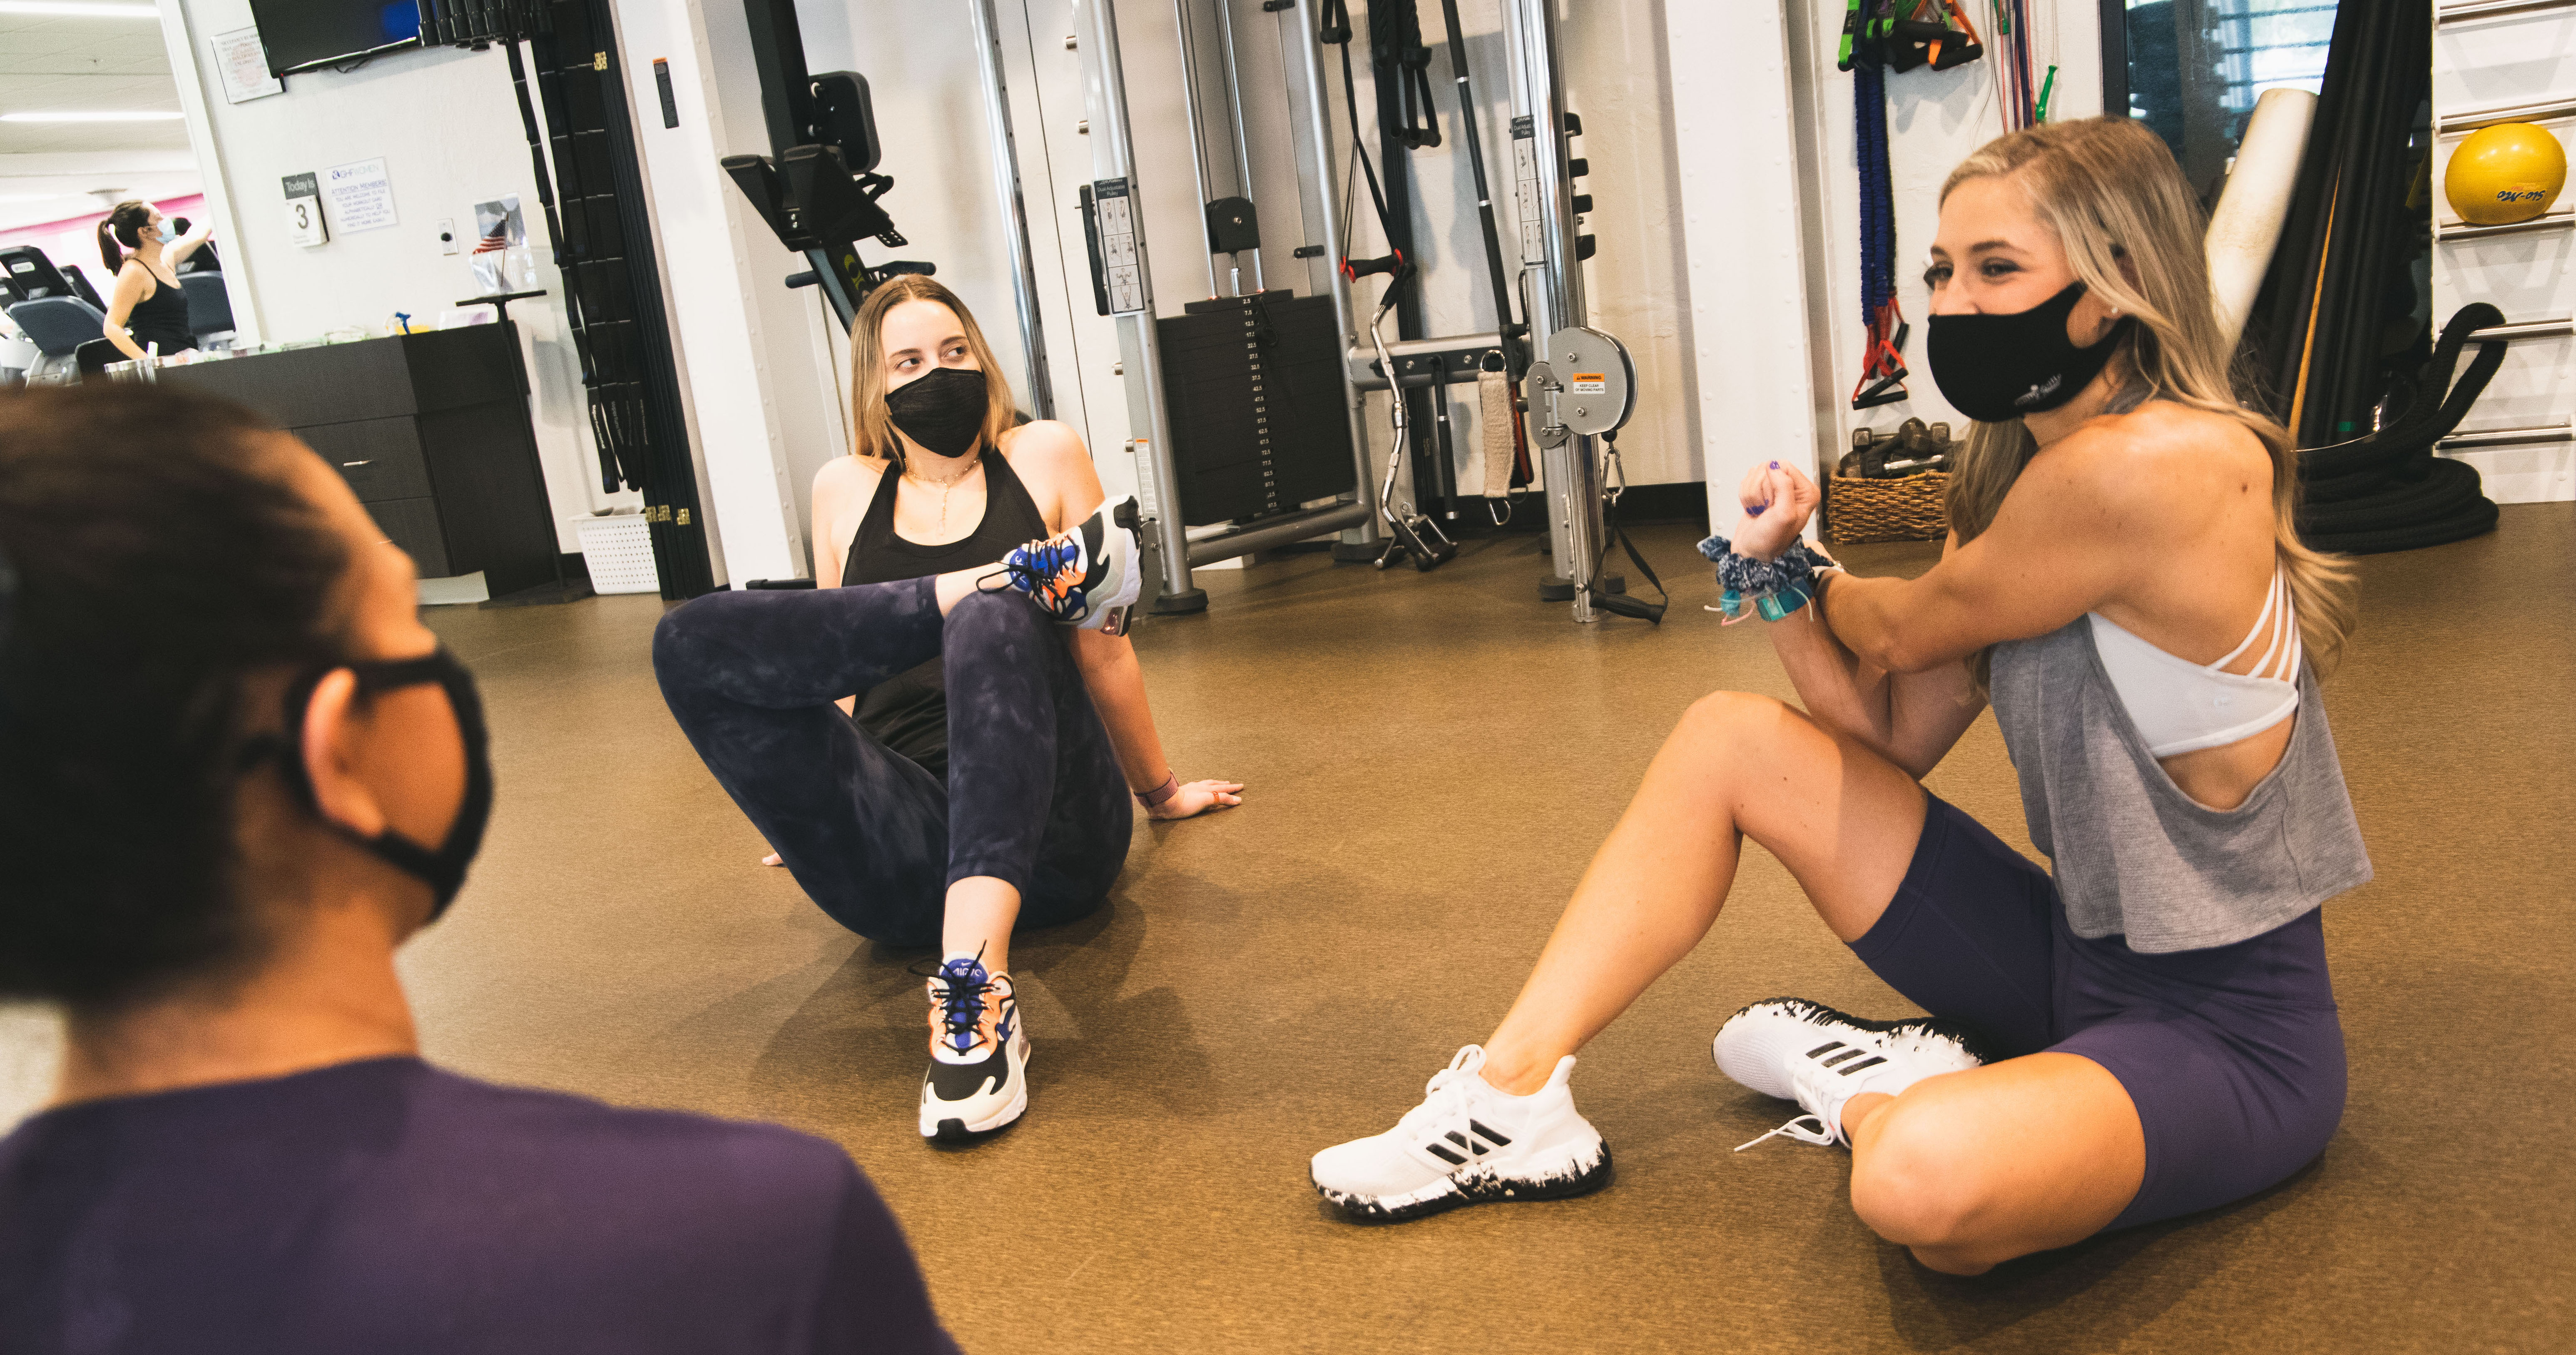 Gym members wearing masks